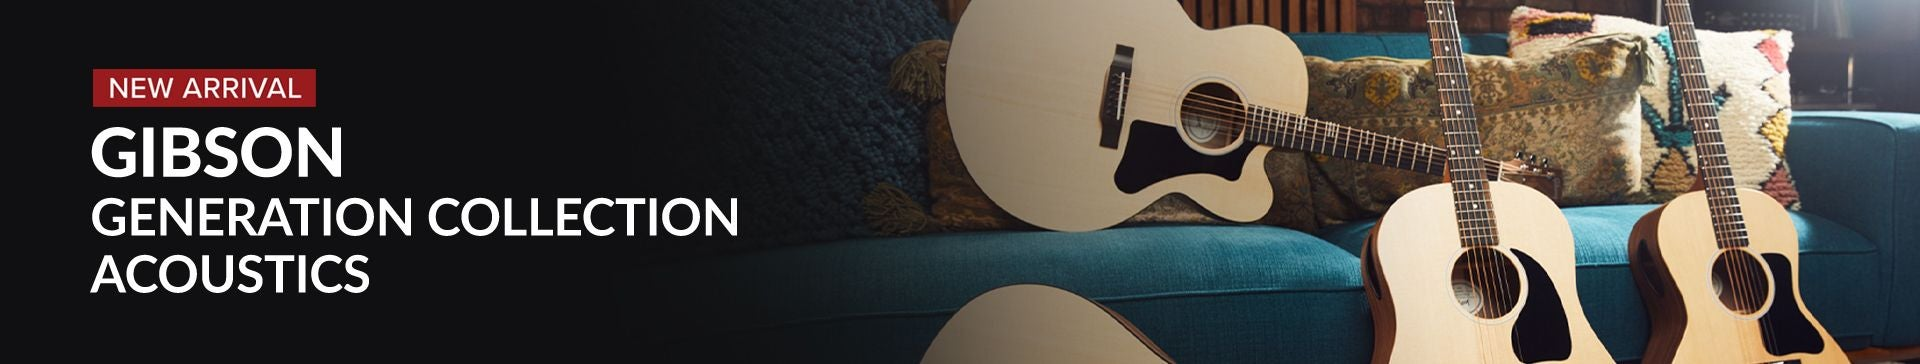 Shop Gibson Generation Collection Acoustics at Sam Ash